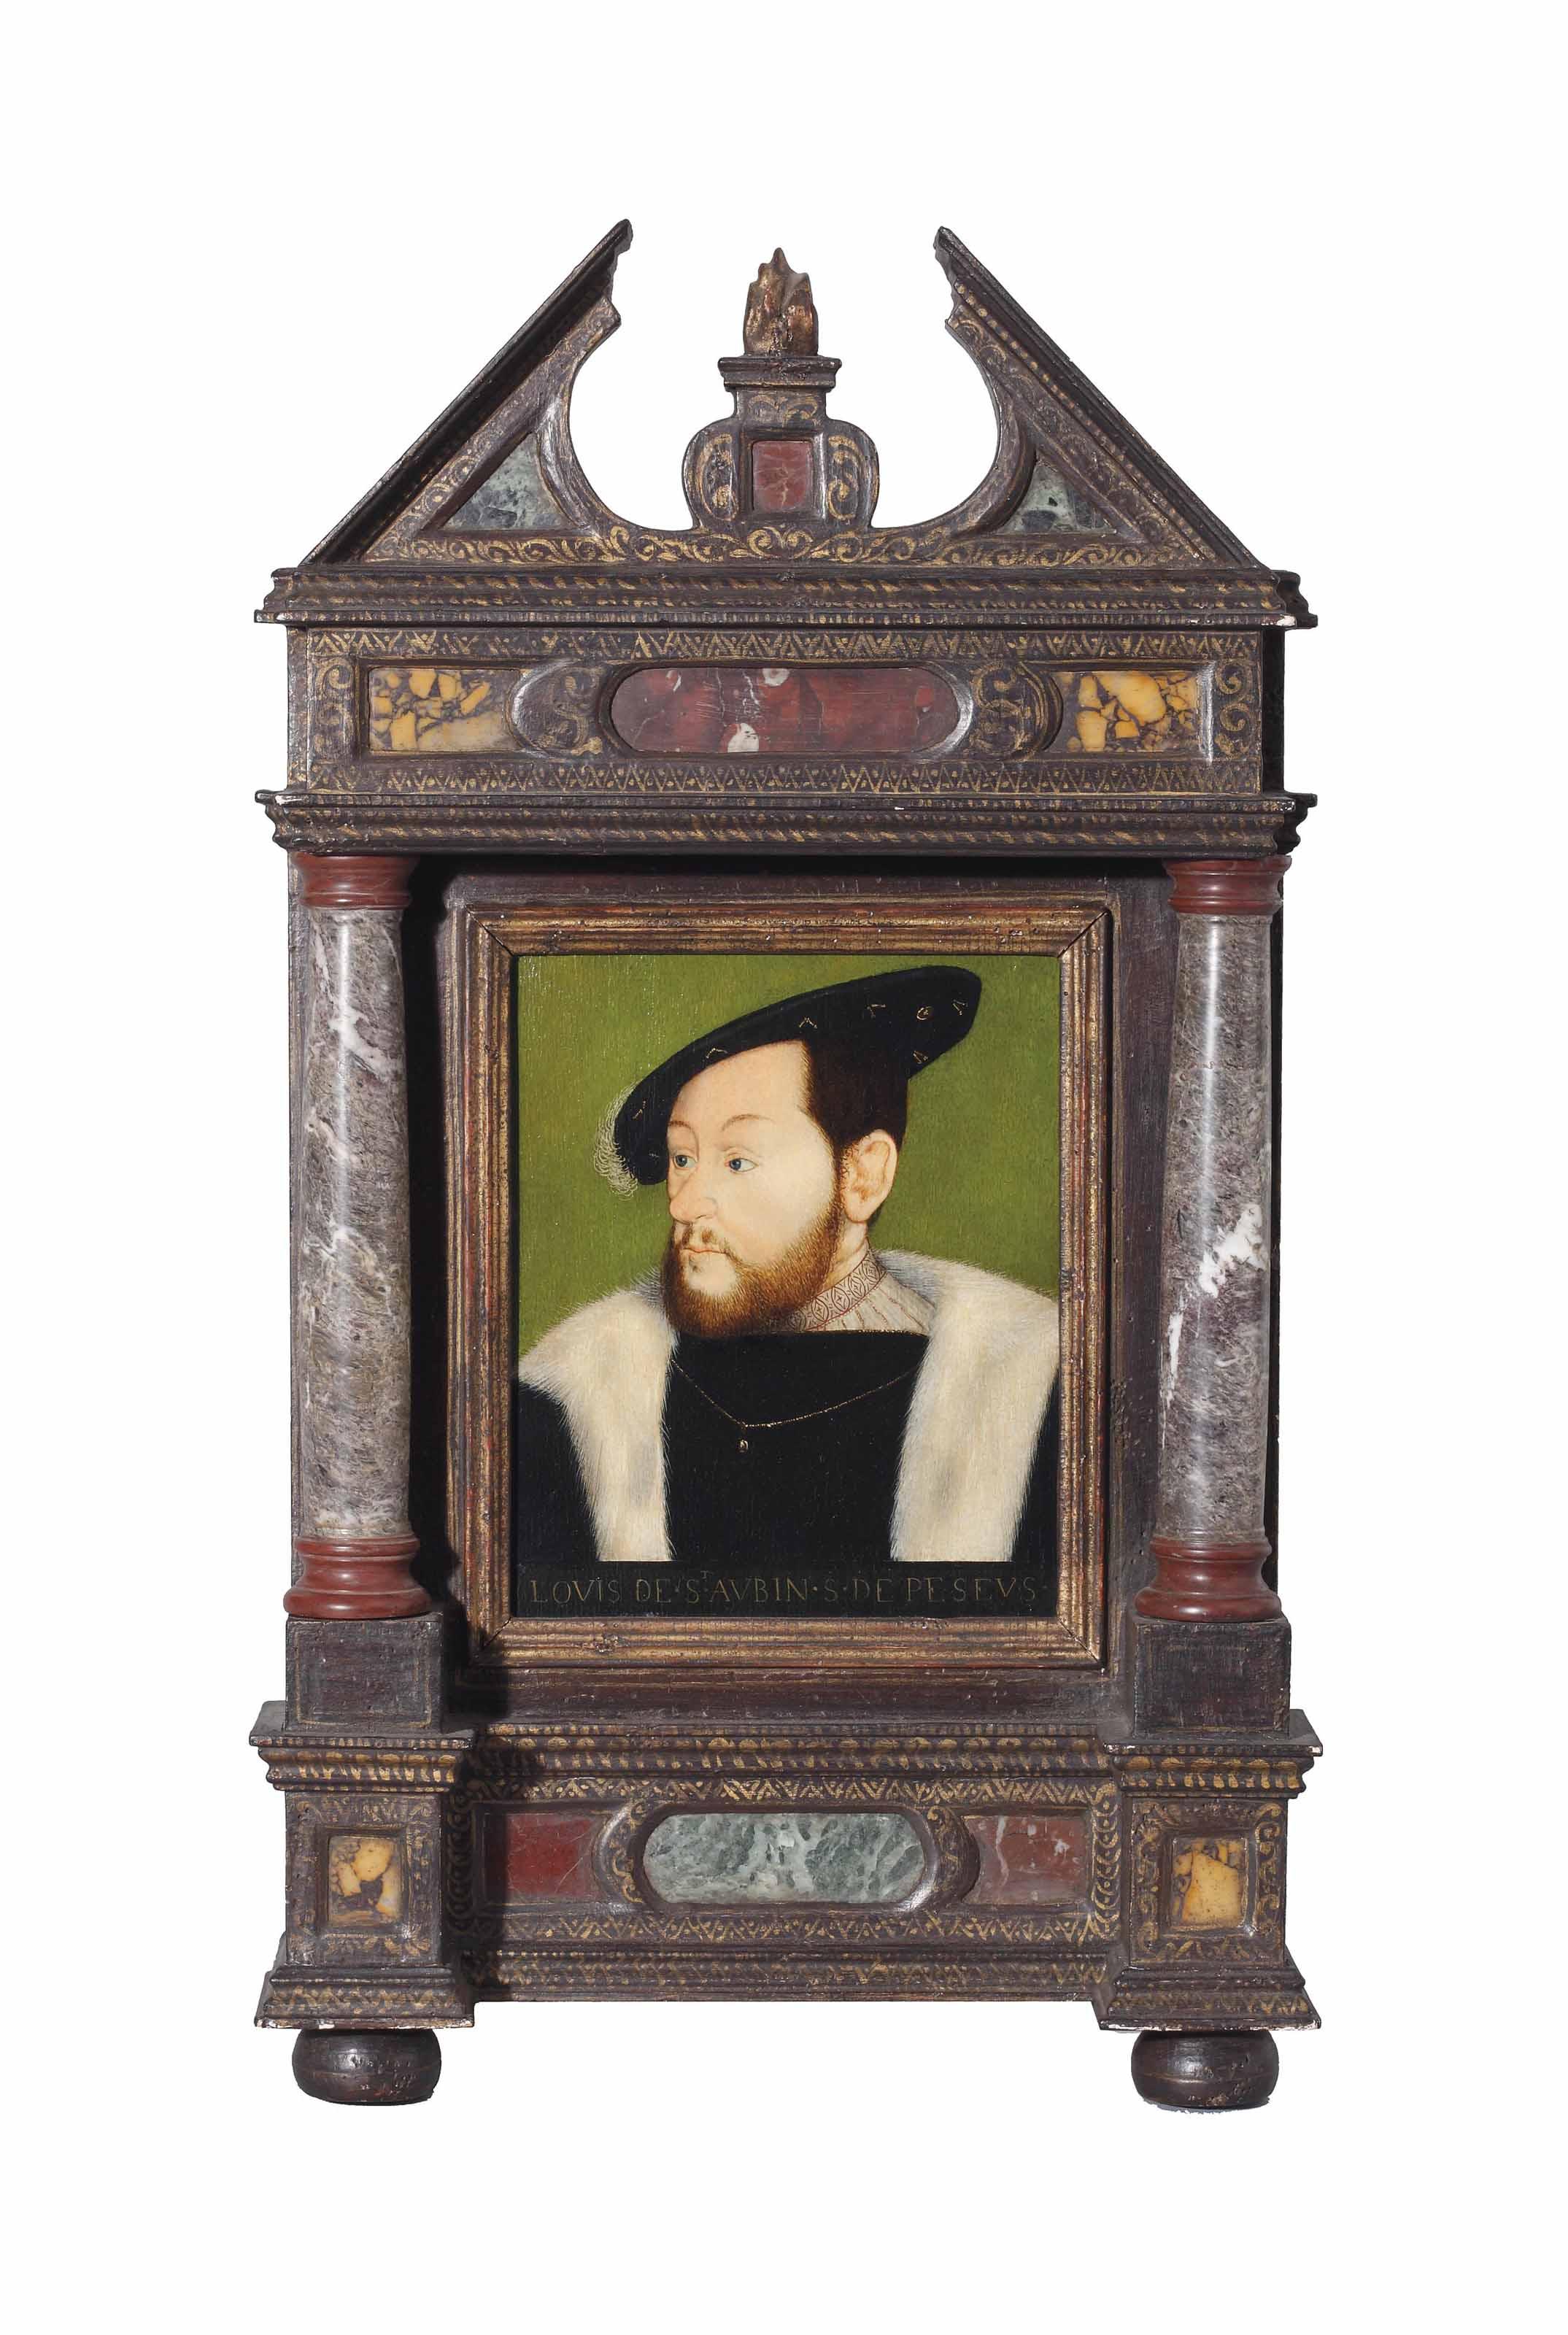 Follower of Corneille de Lyon